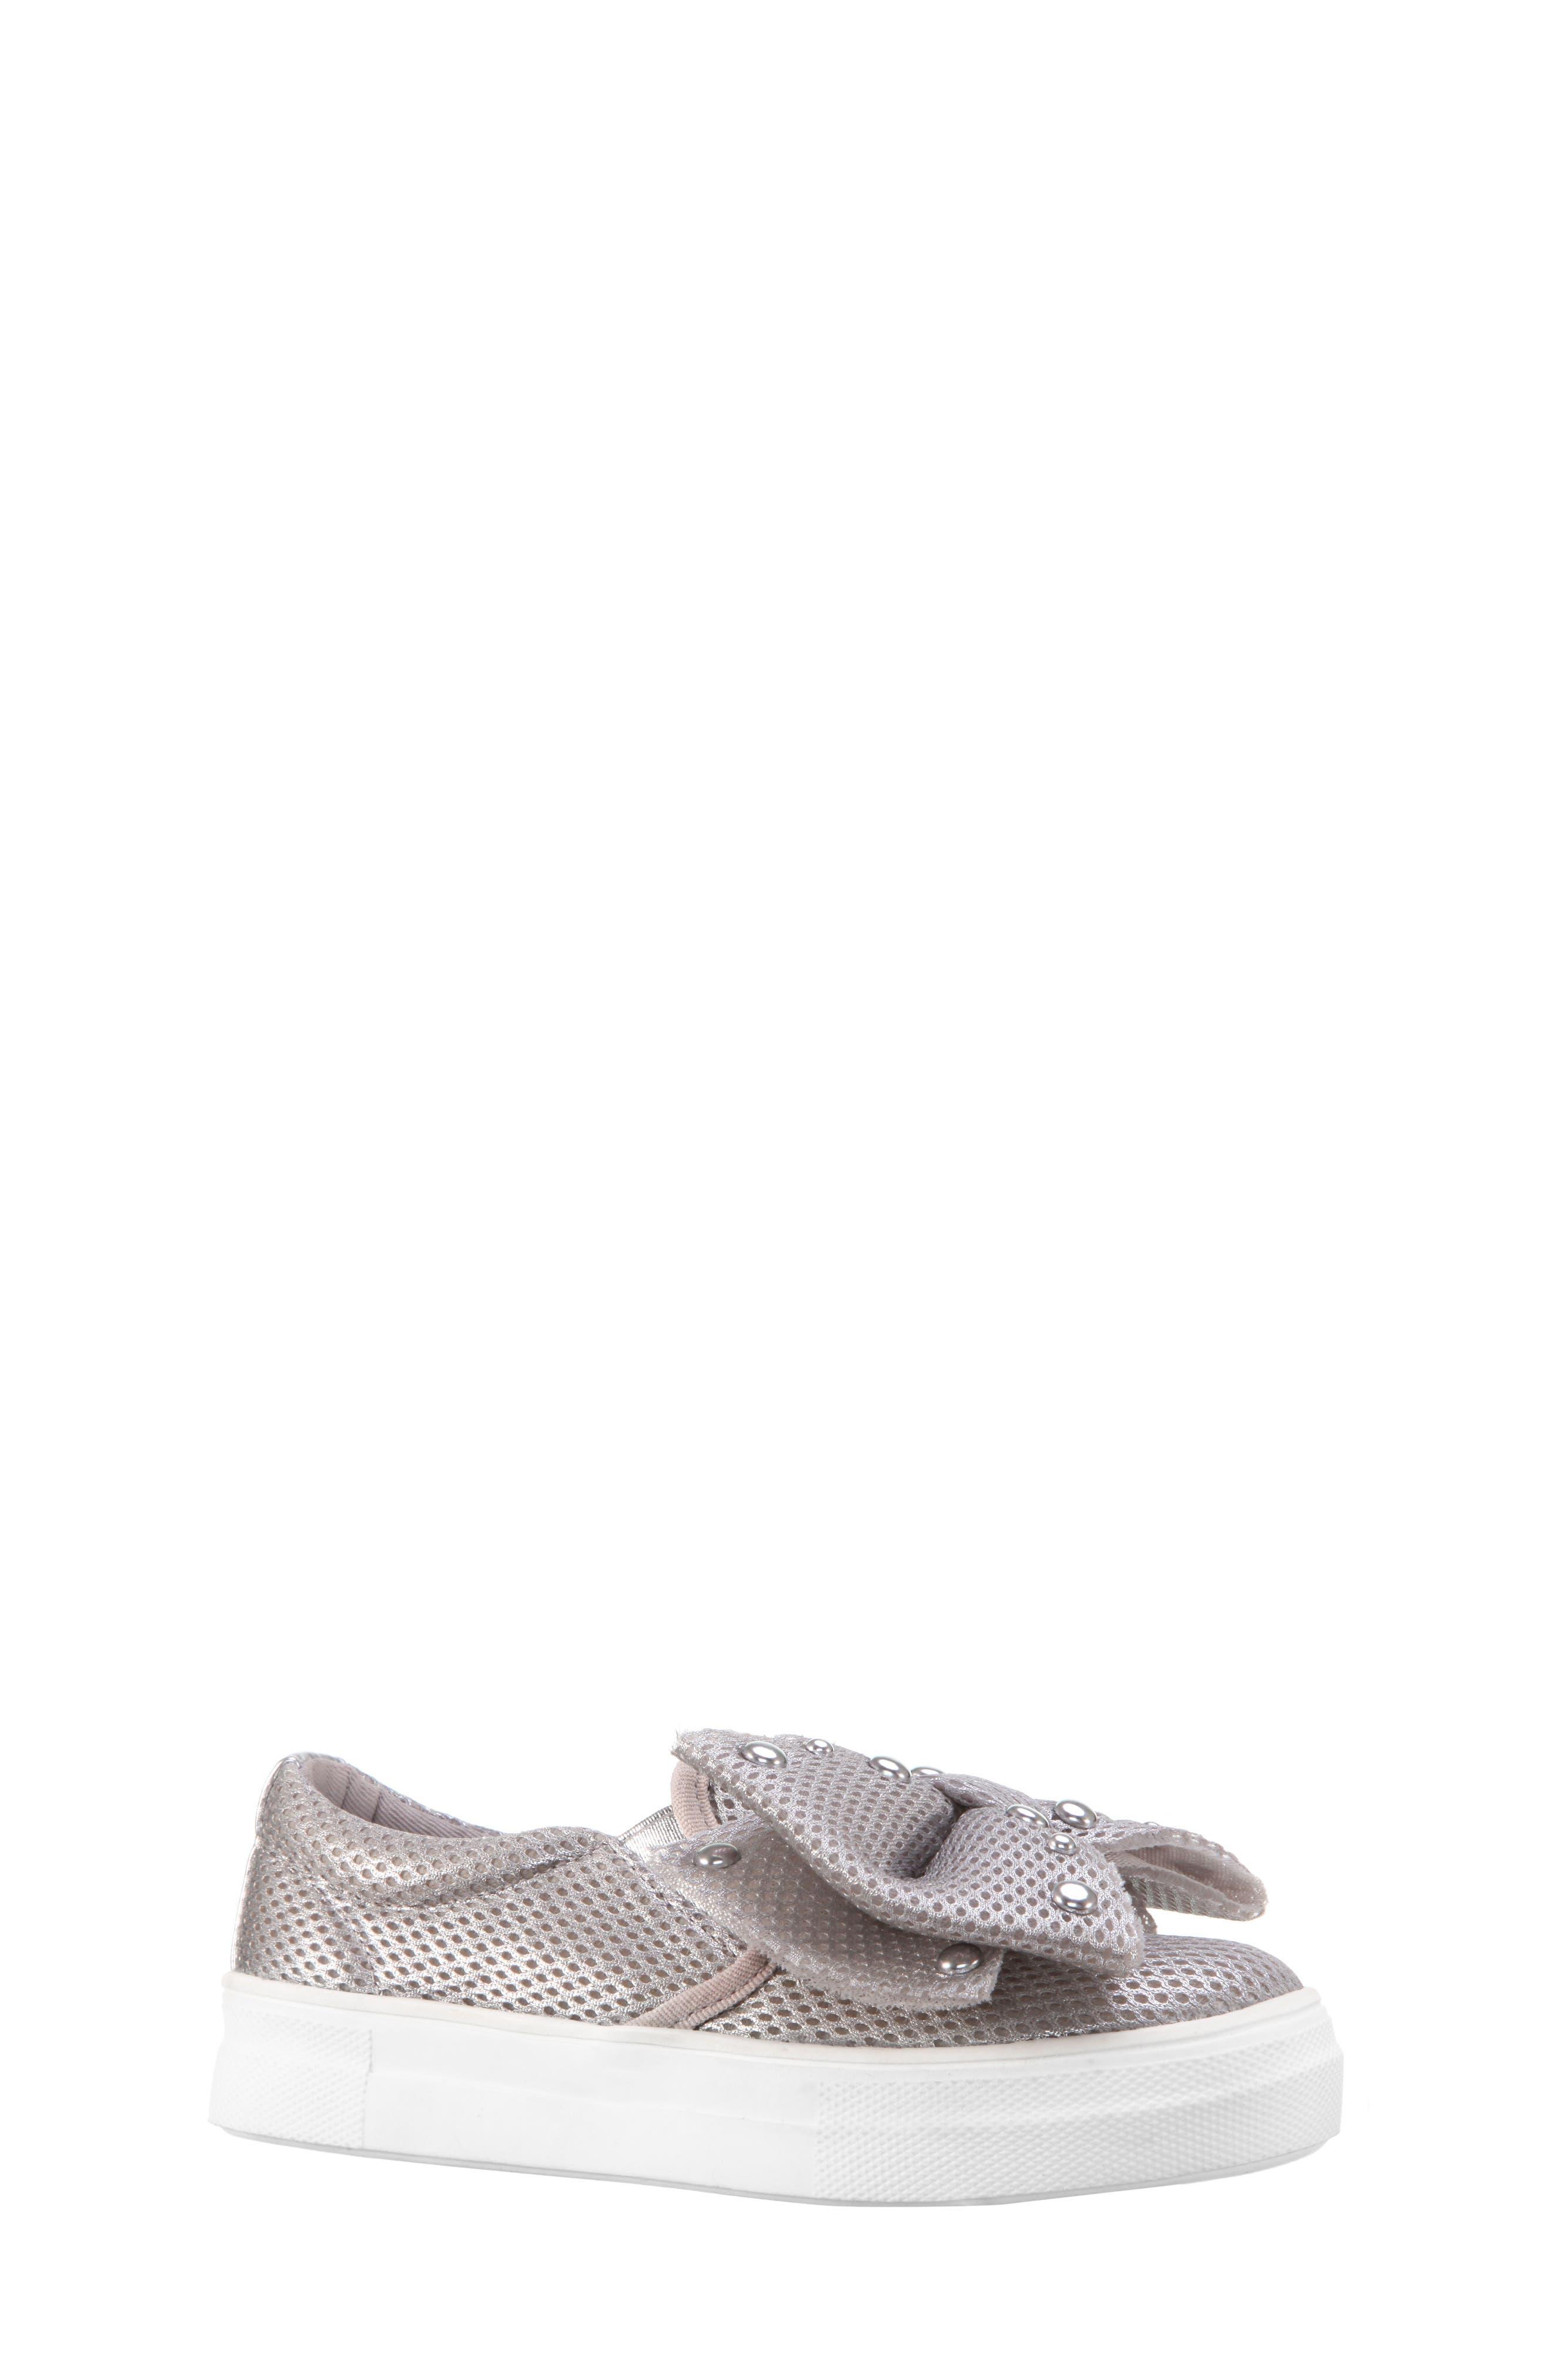 Mary Bow Slip-On Sneaker,                             Main thumbnail 1, color,                             040